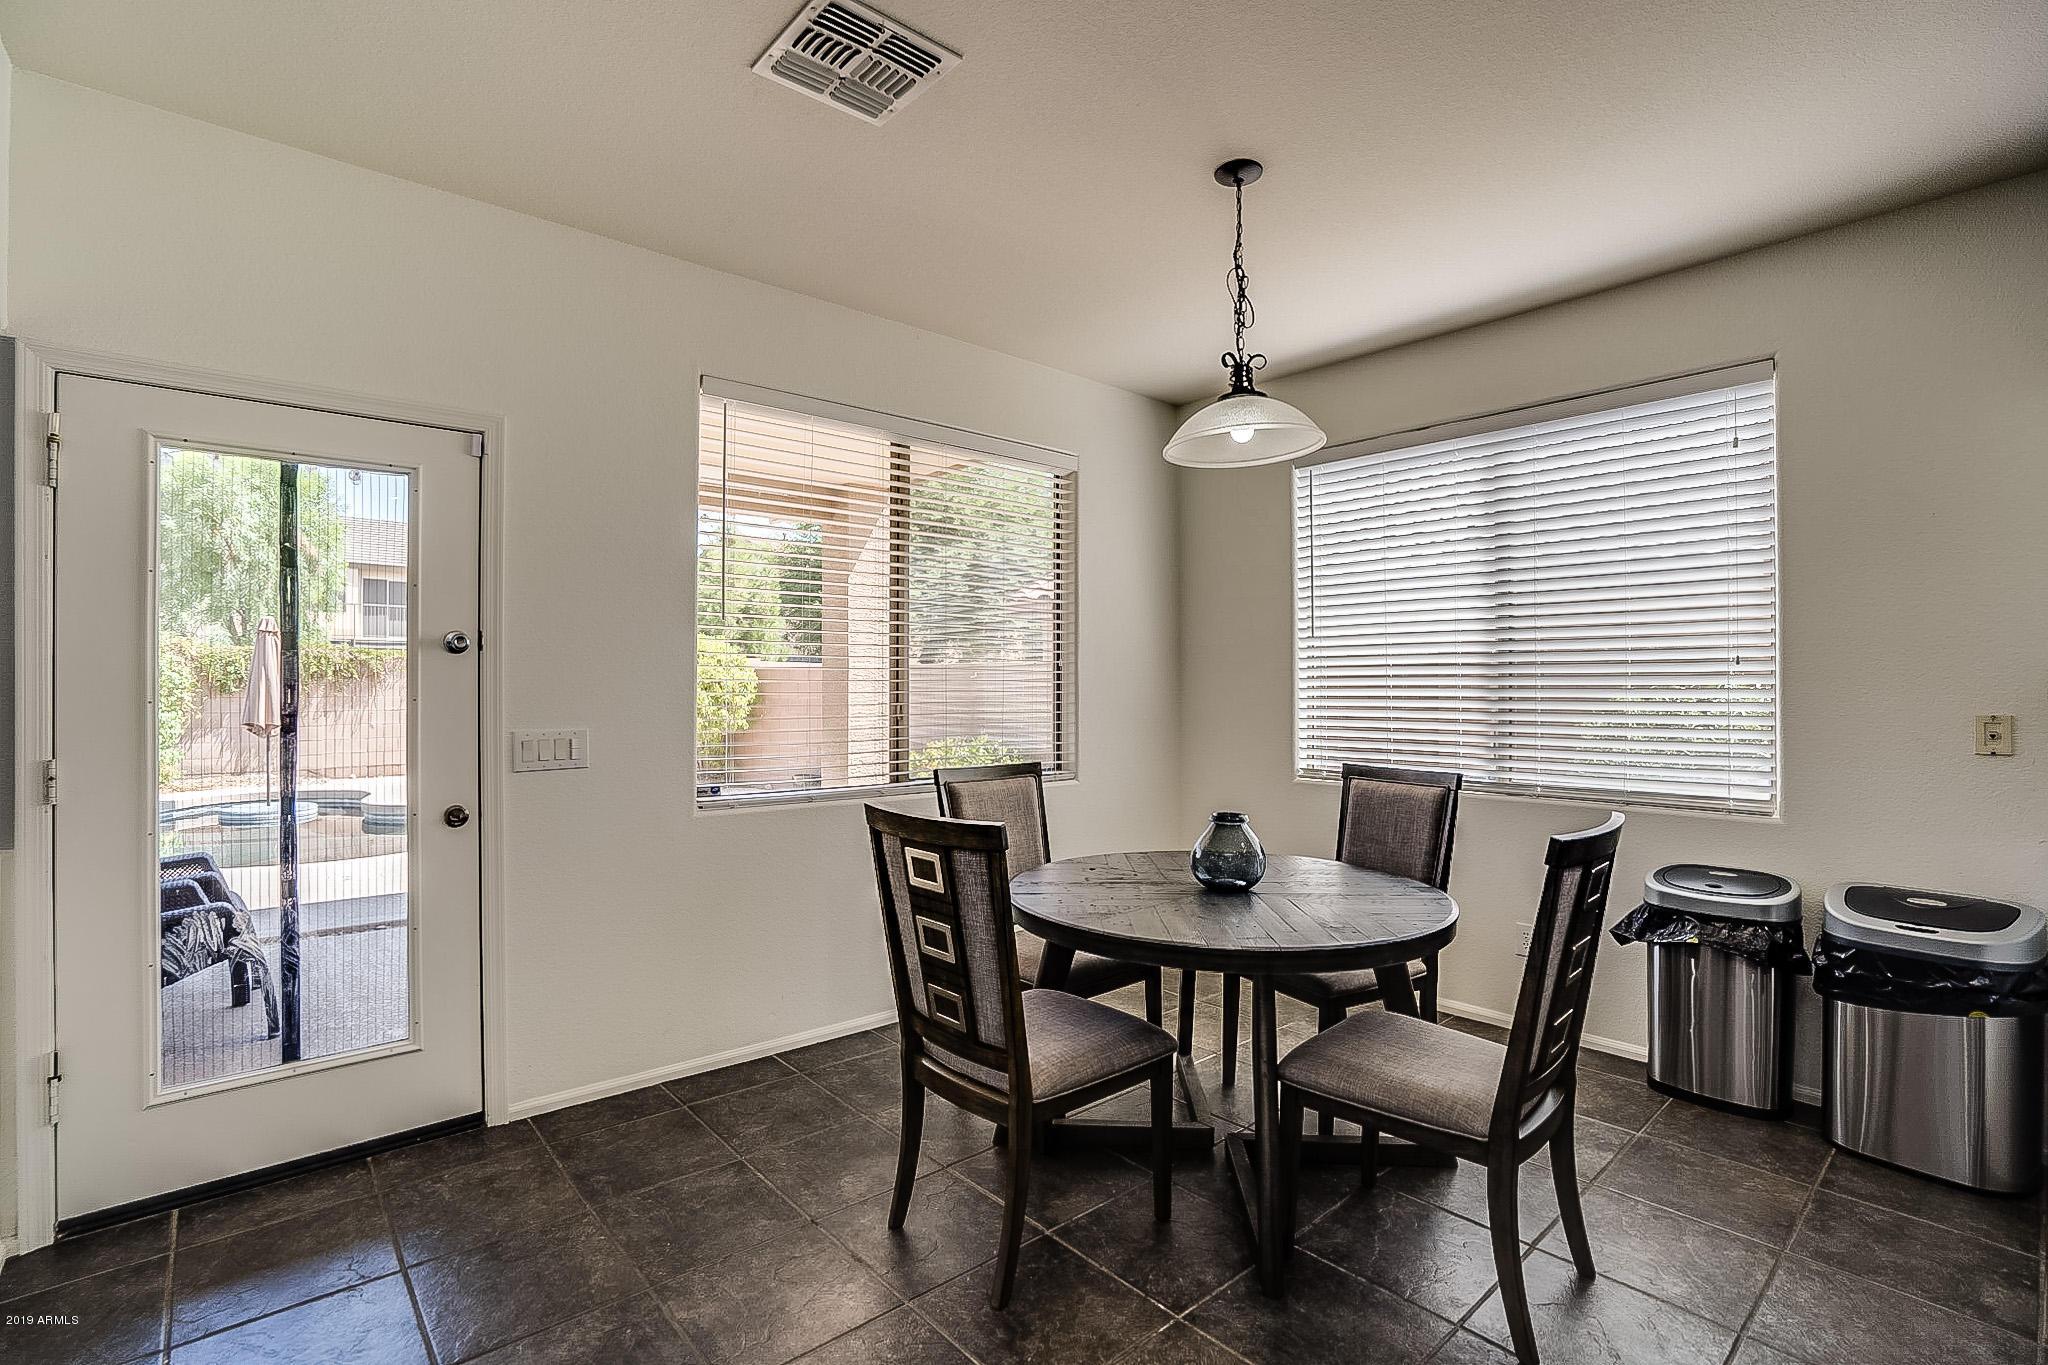 MLS 5962373 5353 N ORMONDO Way, Litchfield Park, AZ 85340 Litchfield Park AZ Four Bedroom